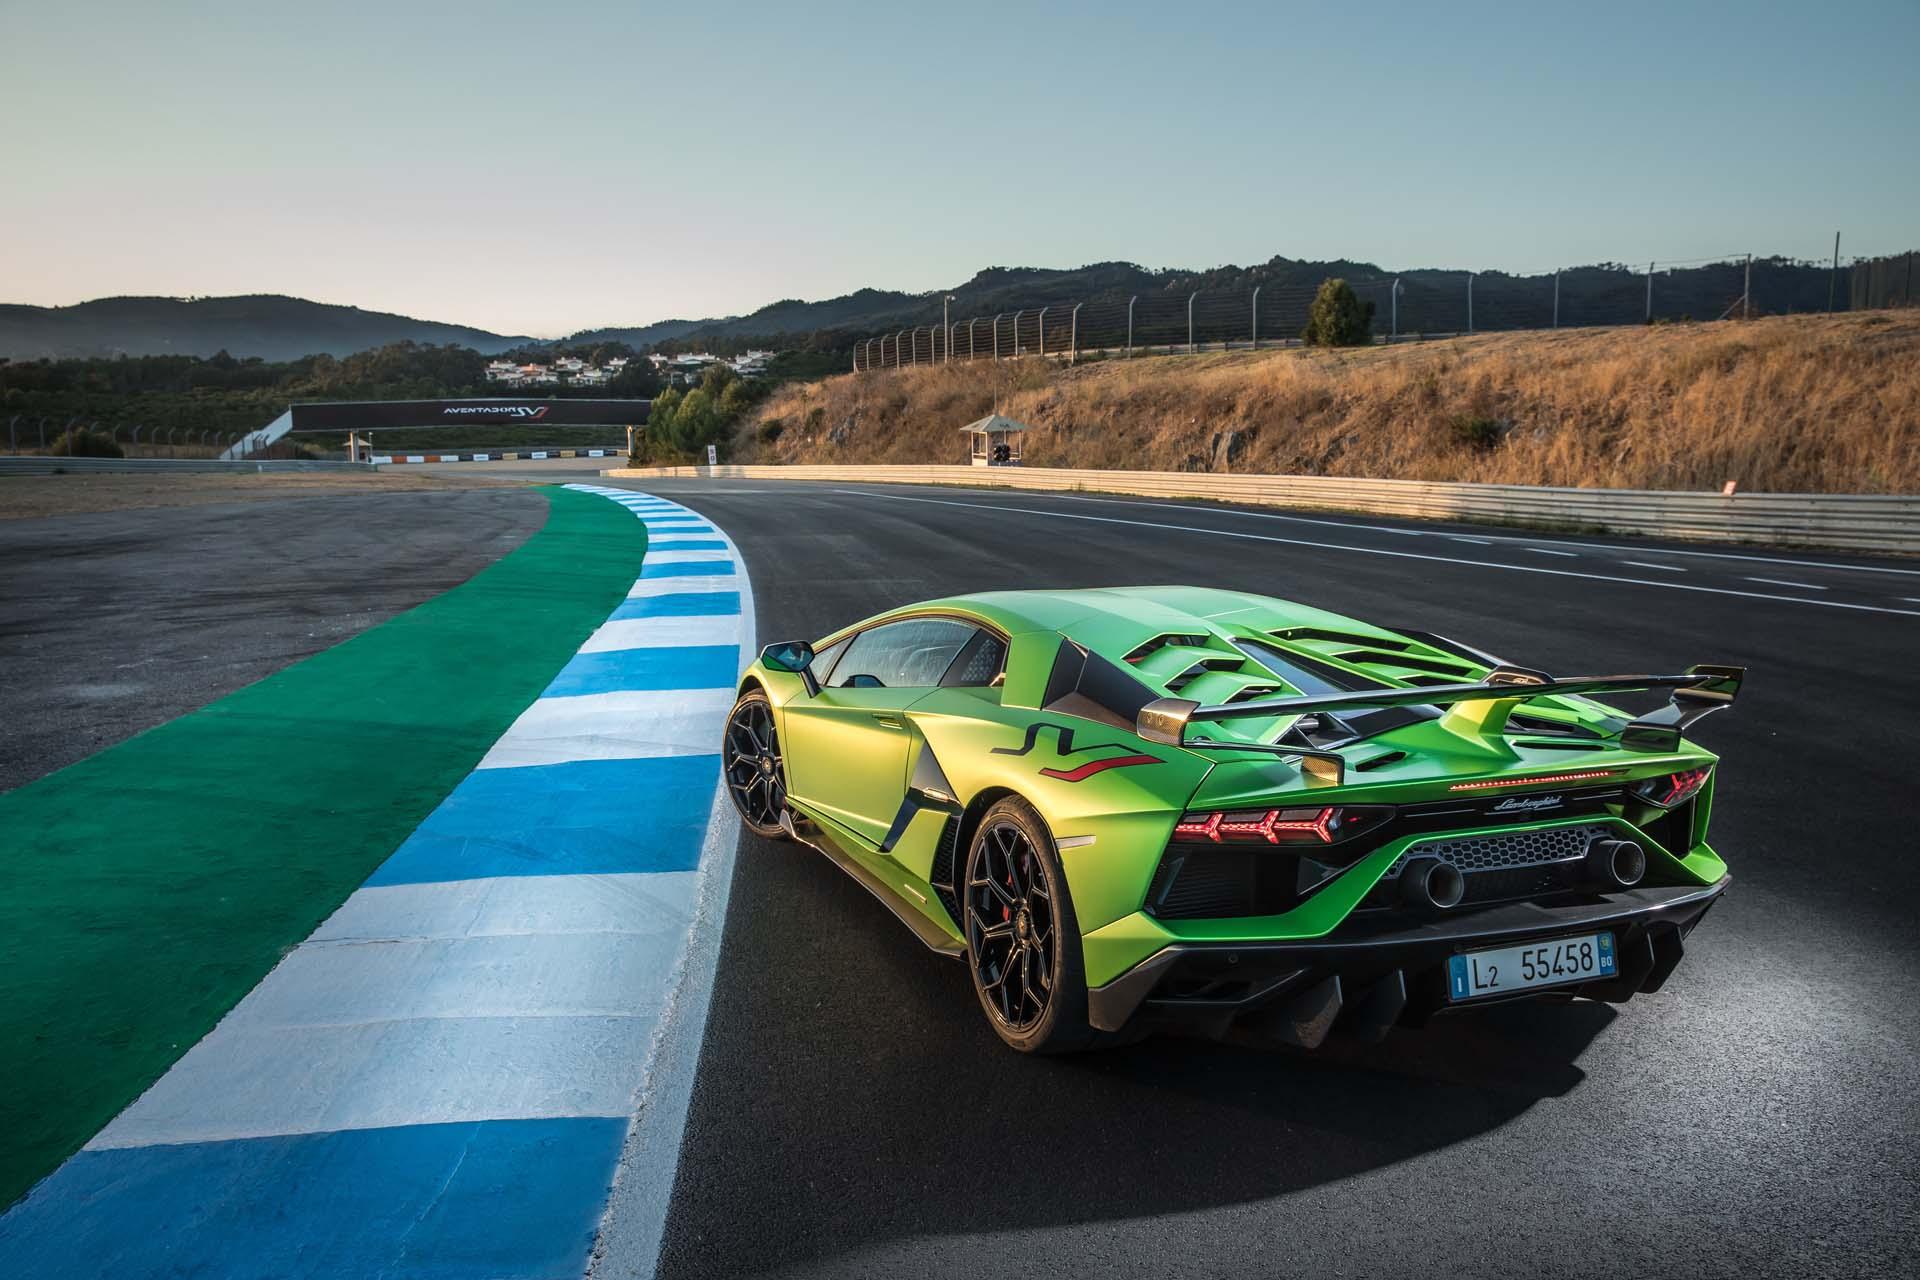 2019 Lamborghini Aventador SVJ Rear Three-Quarter Wallpapers #30 of 241